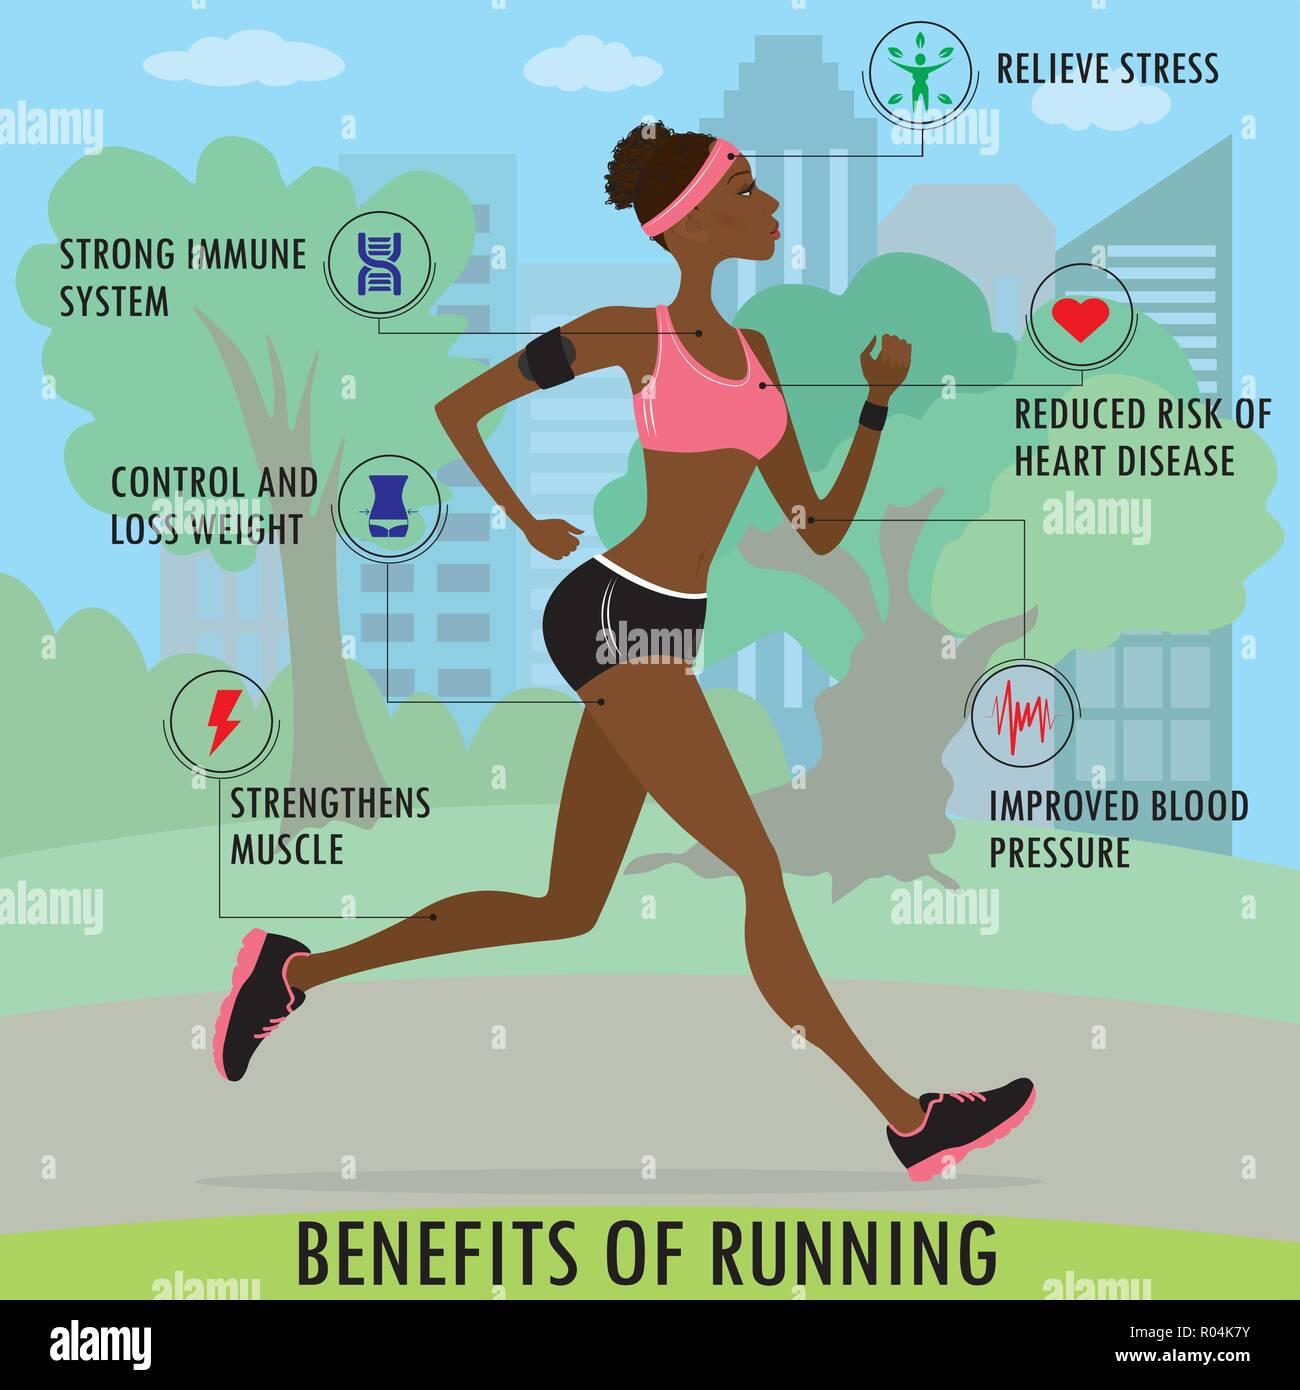 benefits of running, slim woman jogging in the park, fitness cartoon vector illustration - Stock Vector